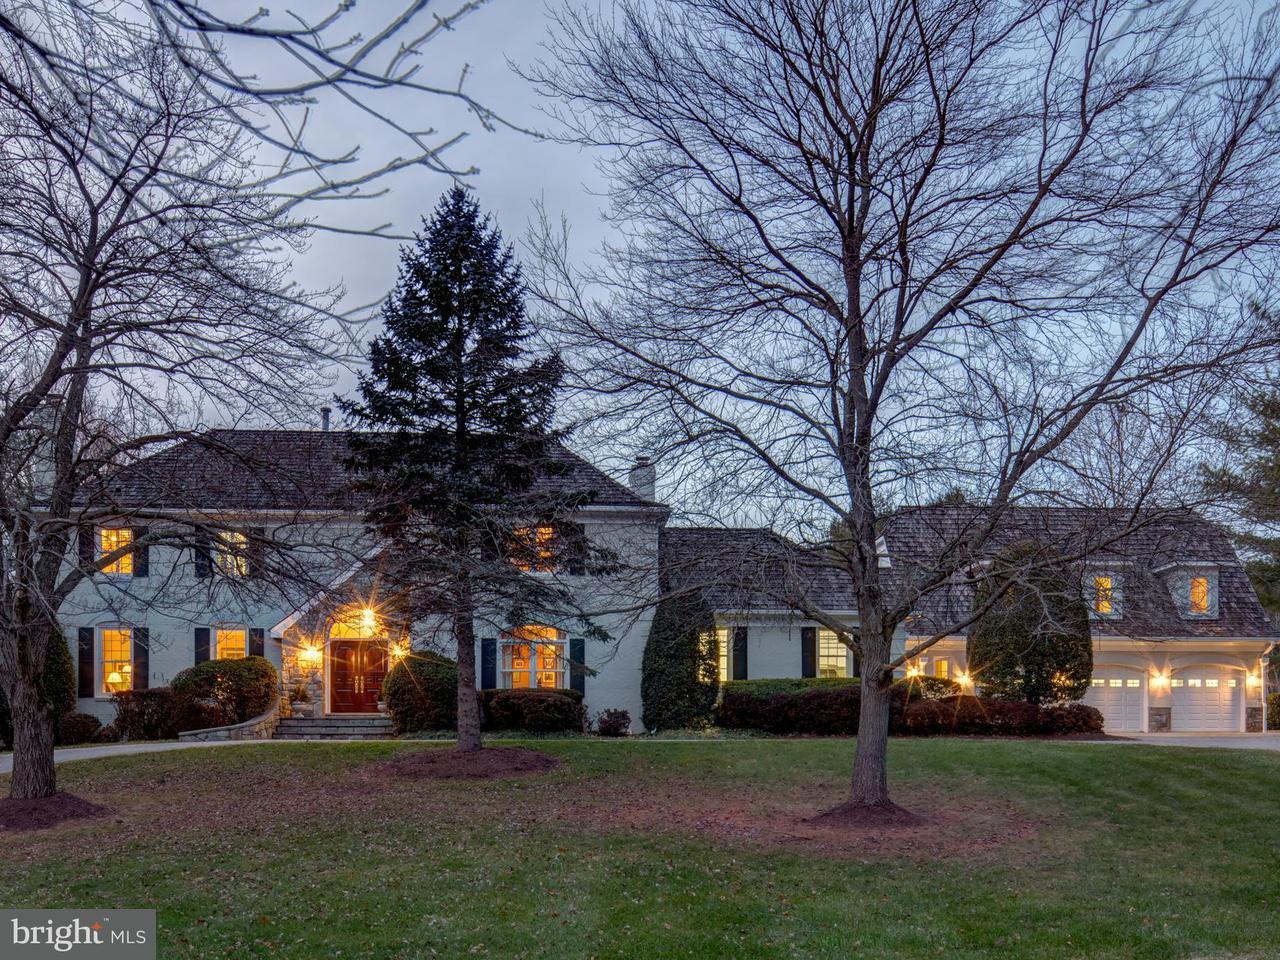 Single Family Home for Sale at 8911 Saunders Lane 8911 Saunders Lane Bethesda, Maryland 20817 United States